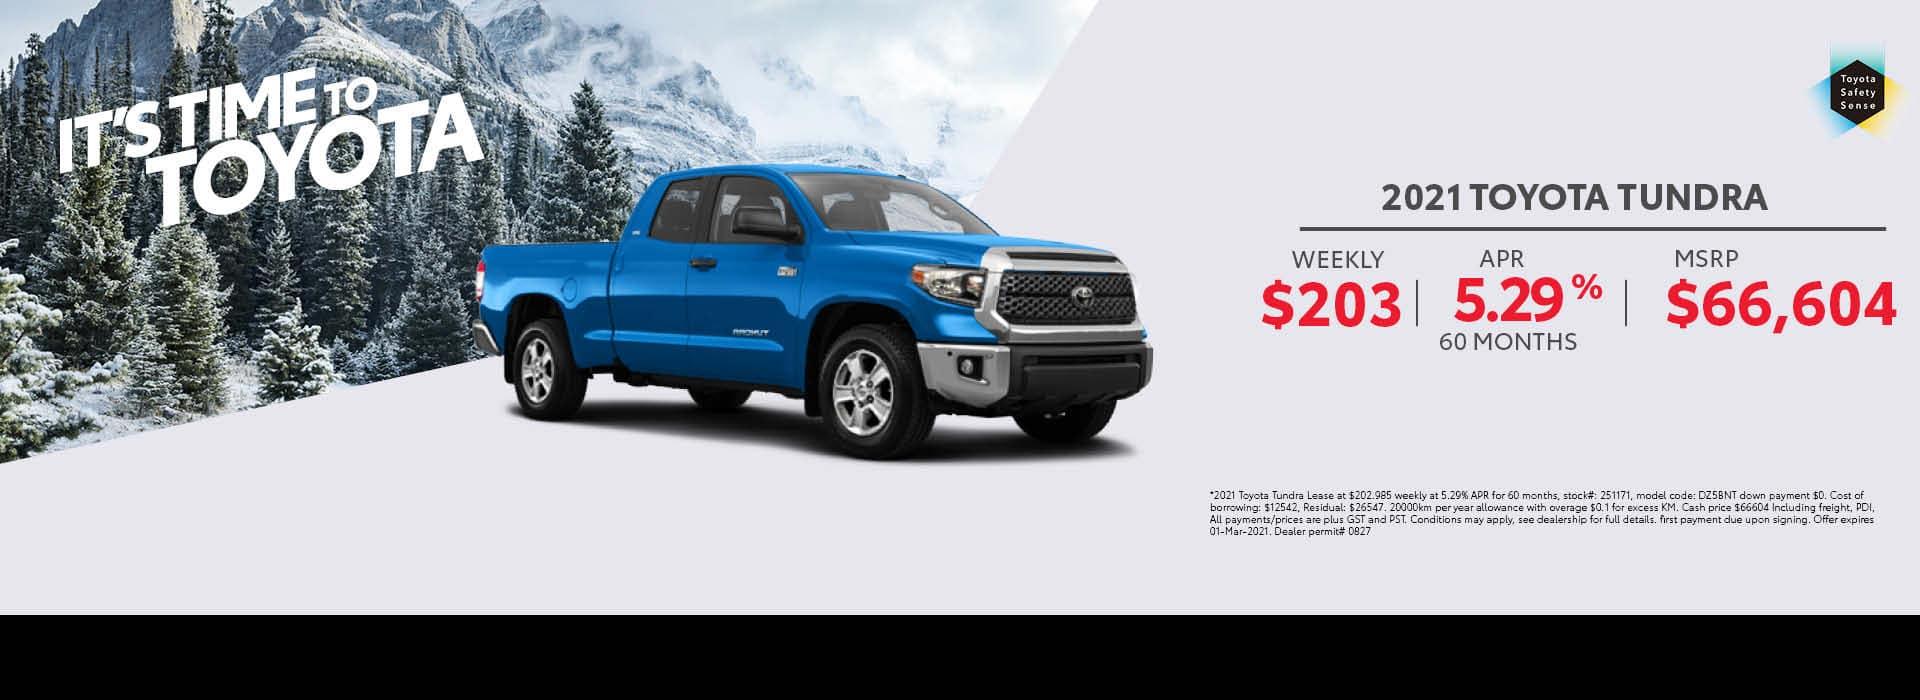 2021_Toyota_Tundra_Desktop_Home_Page_Banner_Feb202111